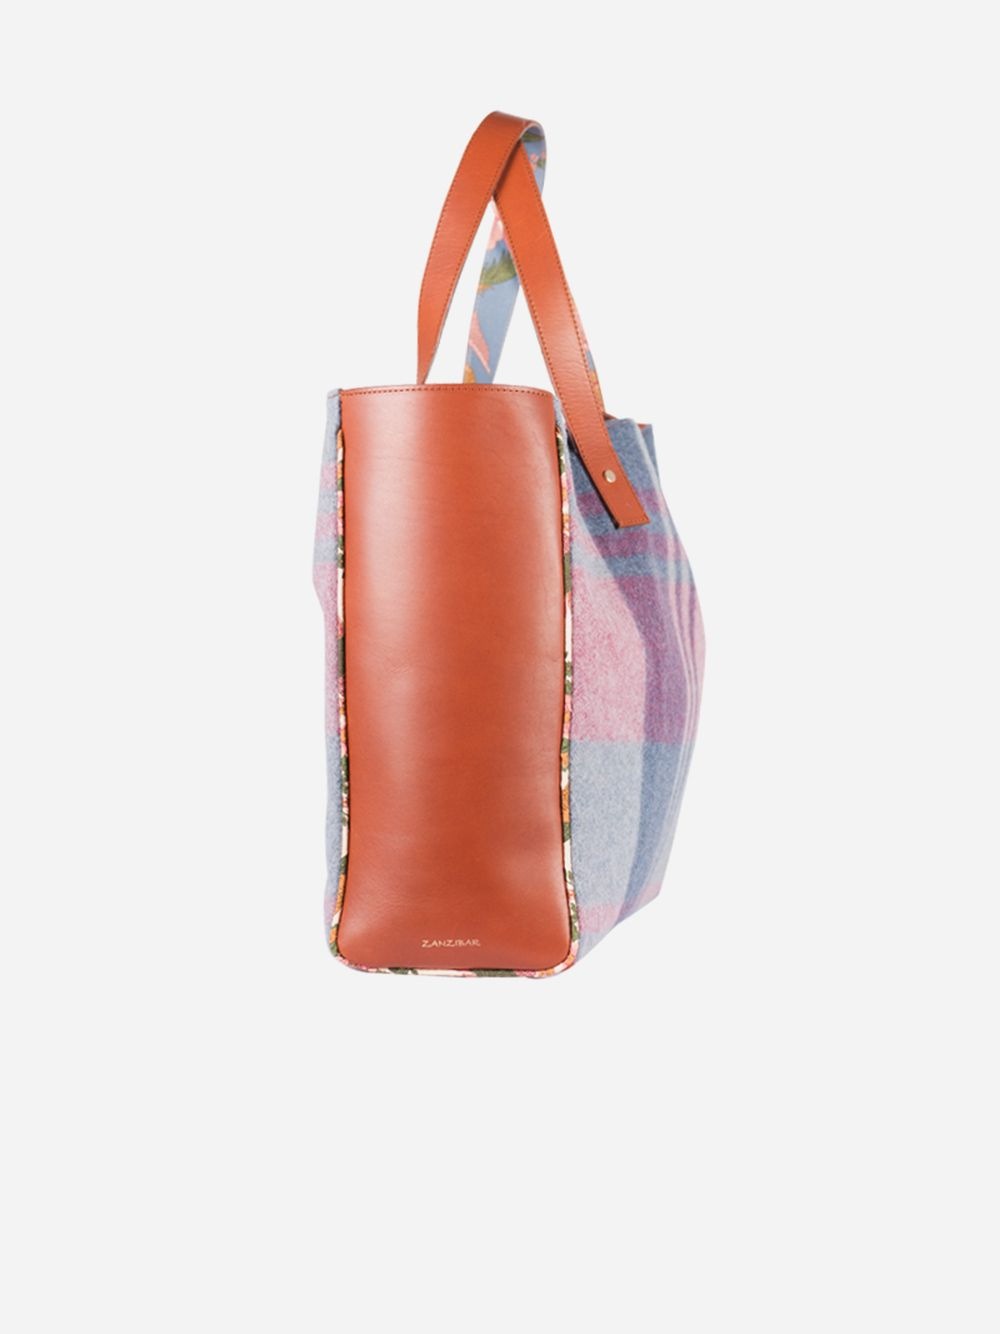 Checked Pink Bag   Zanzibar